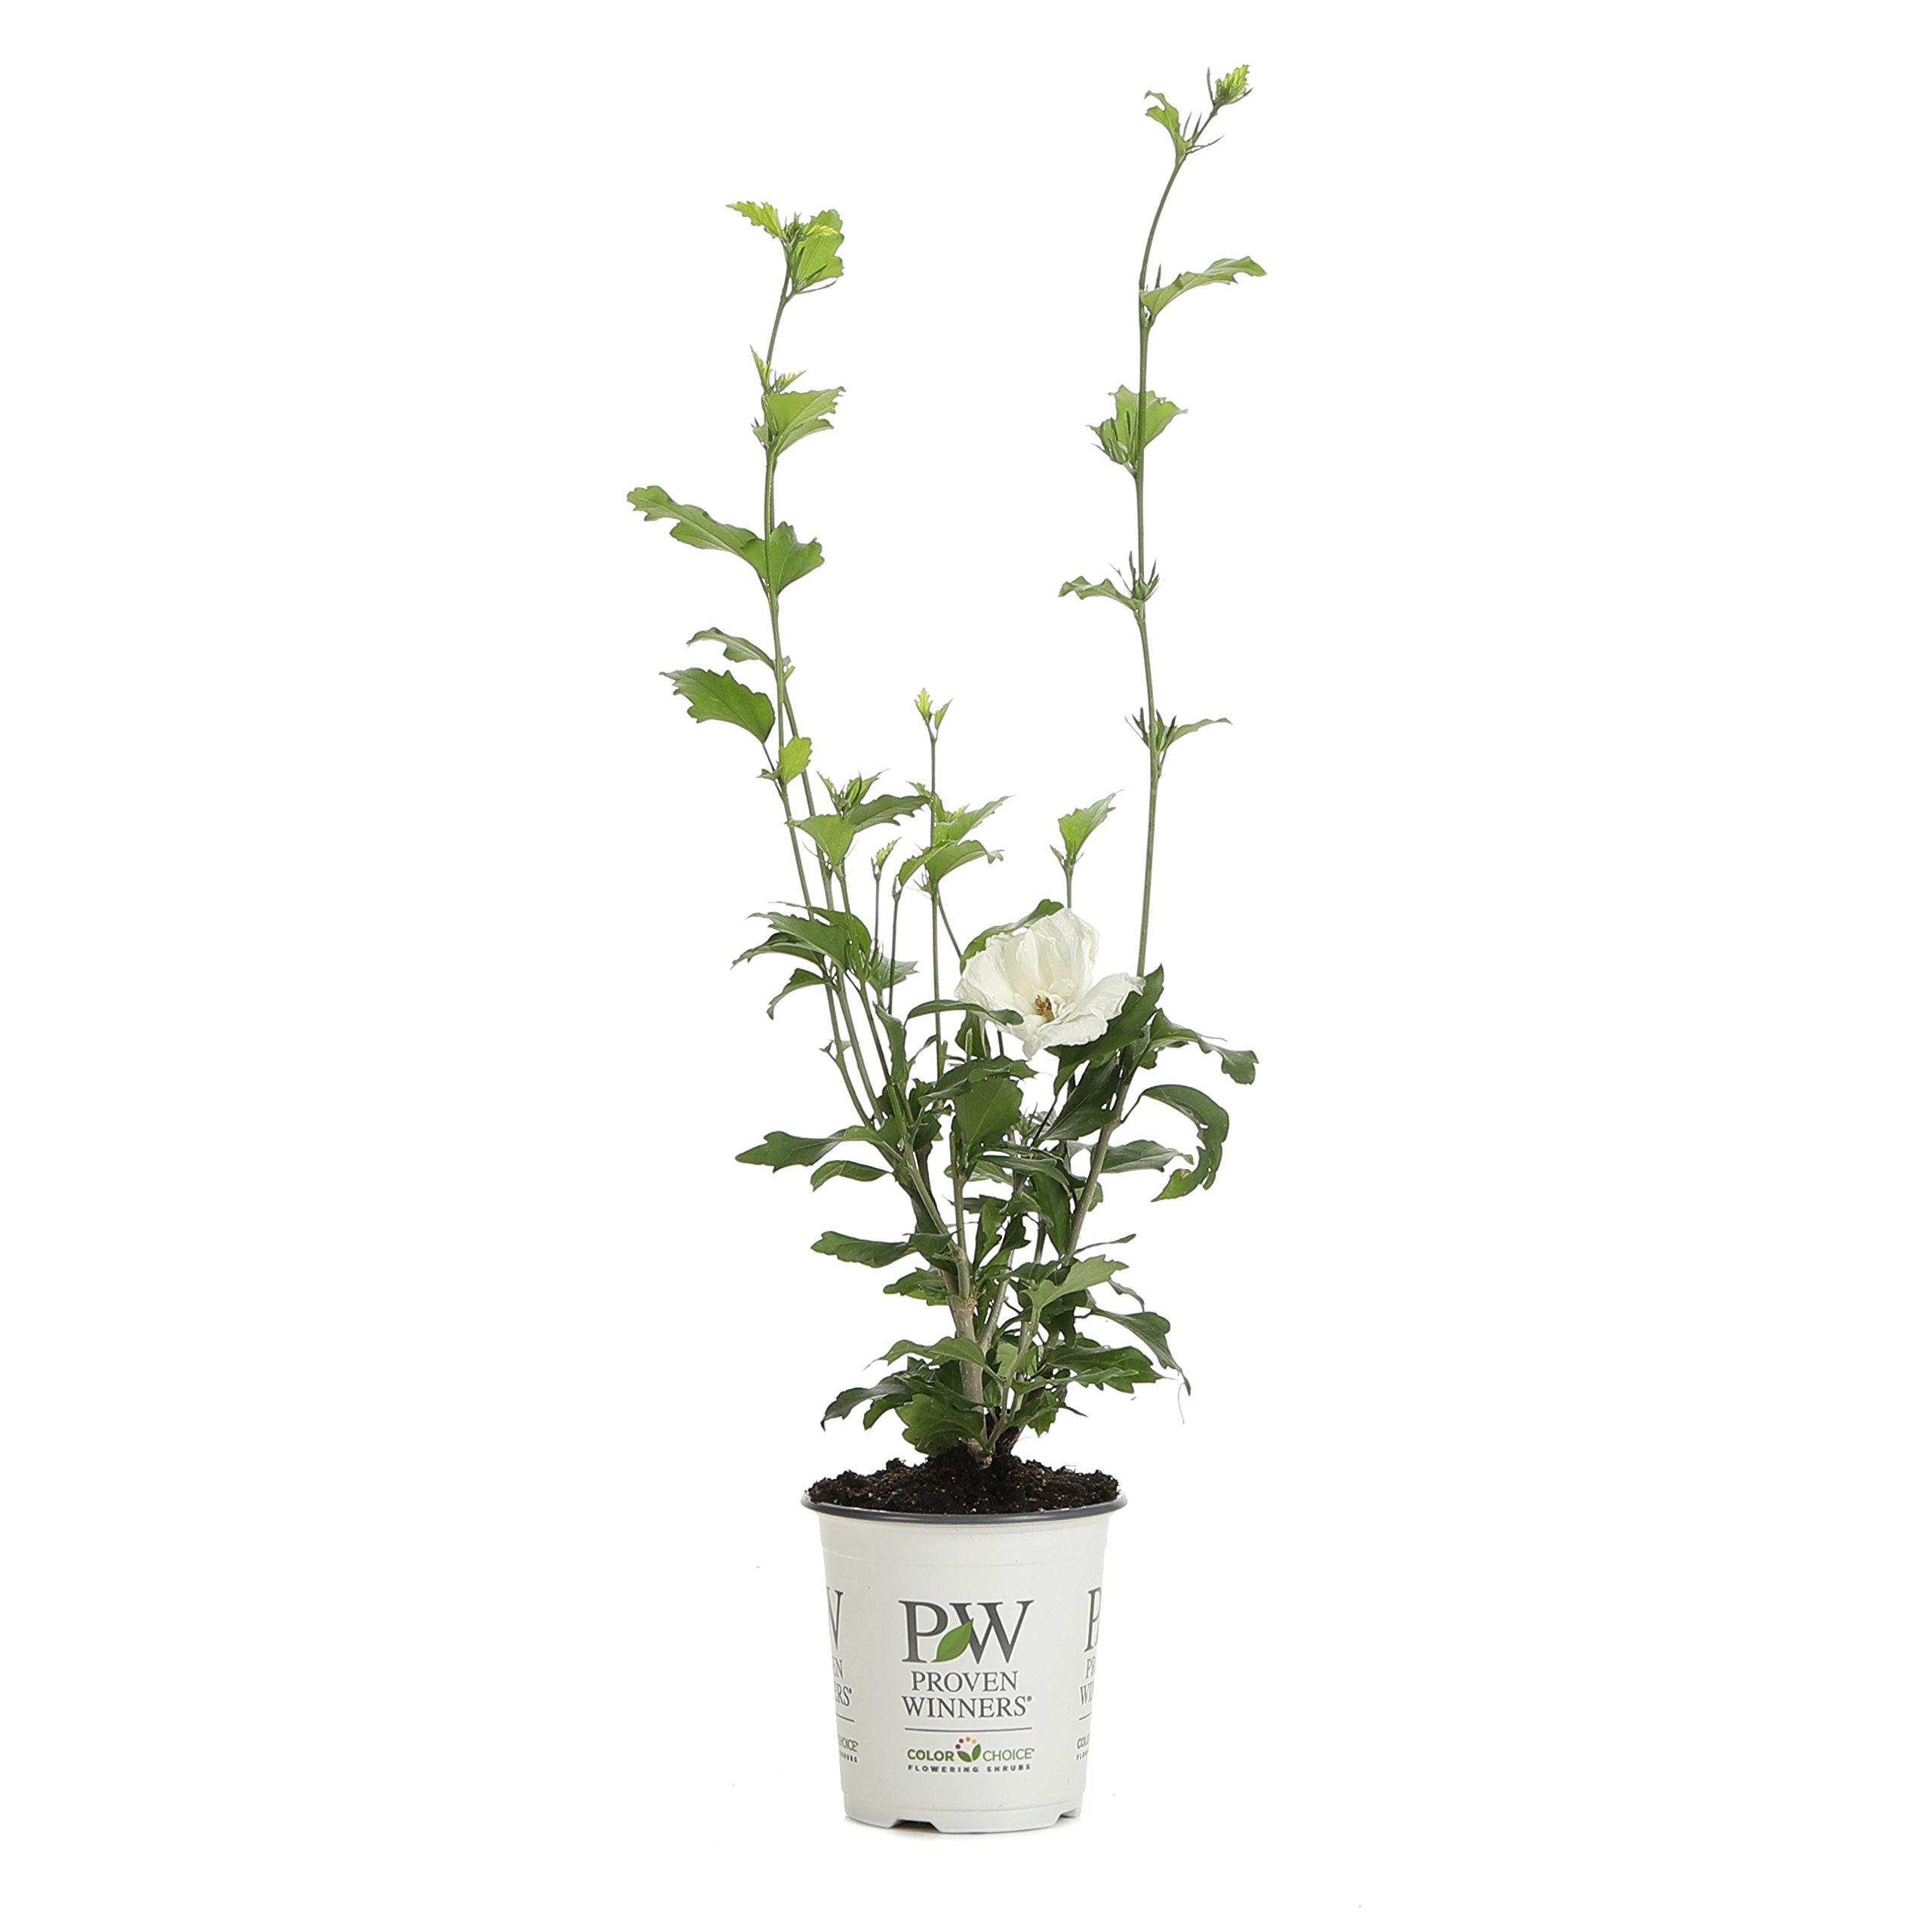 White Chiffon Rose of Sharon (Hibiscus) Live Shrub, White Flowers, 4.5 in. Quart